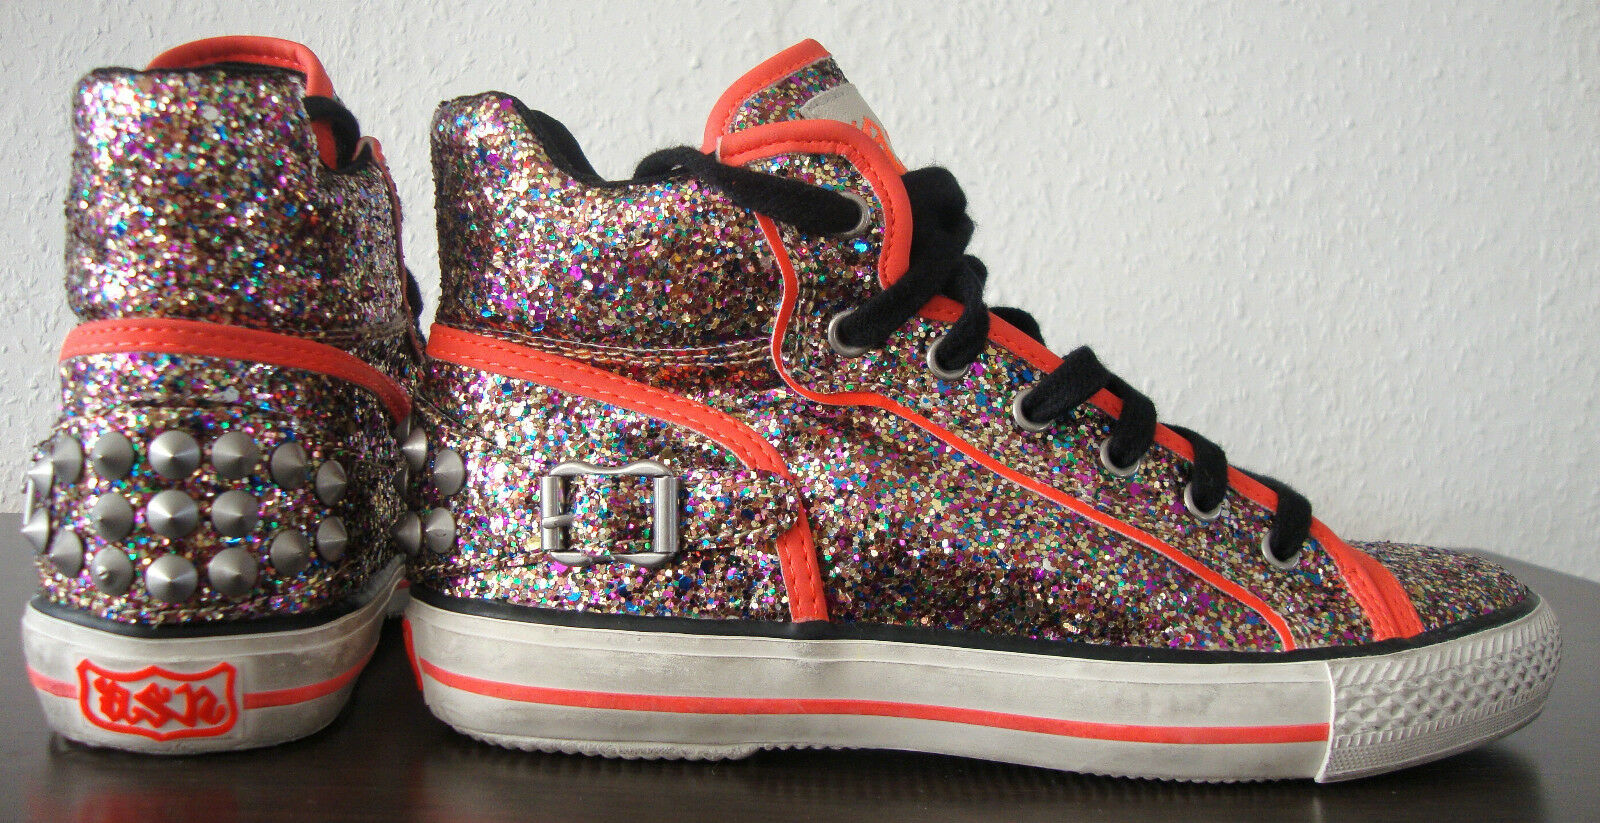 Ash grönigo Traniers Ankle skor skor skor kvinnor skor skor Glitter Studs Storlek 37 ny  billig butik